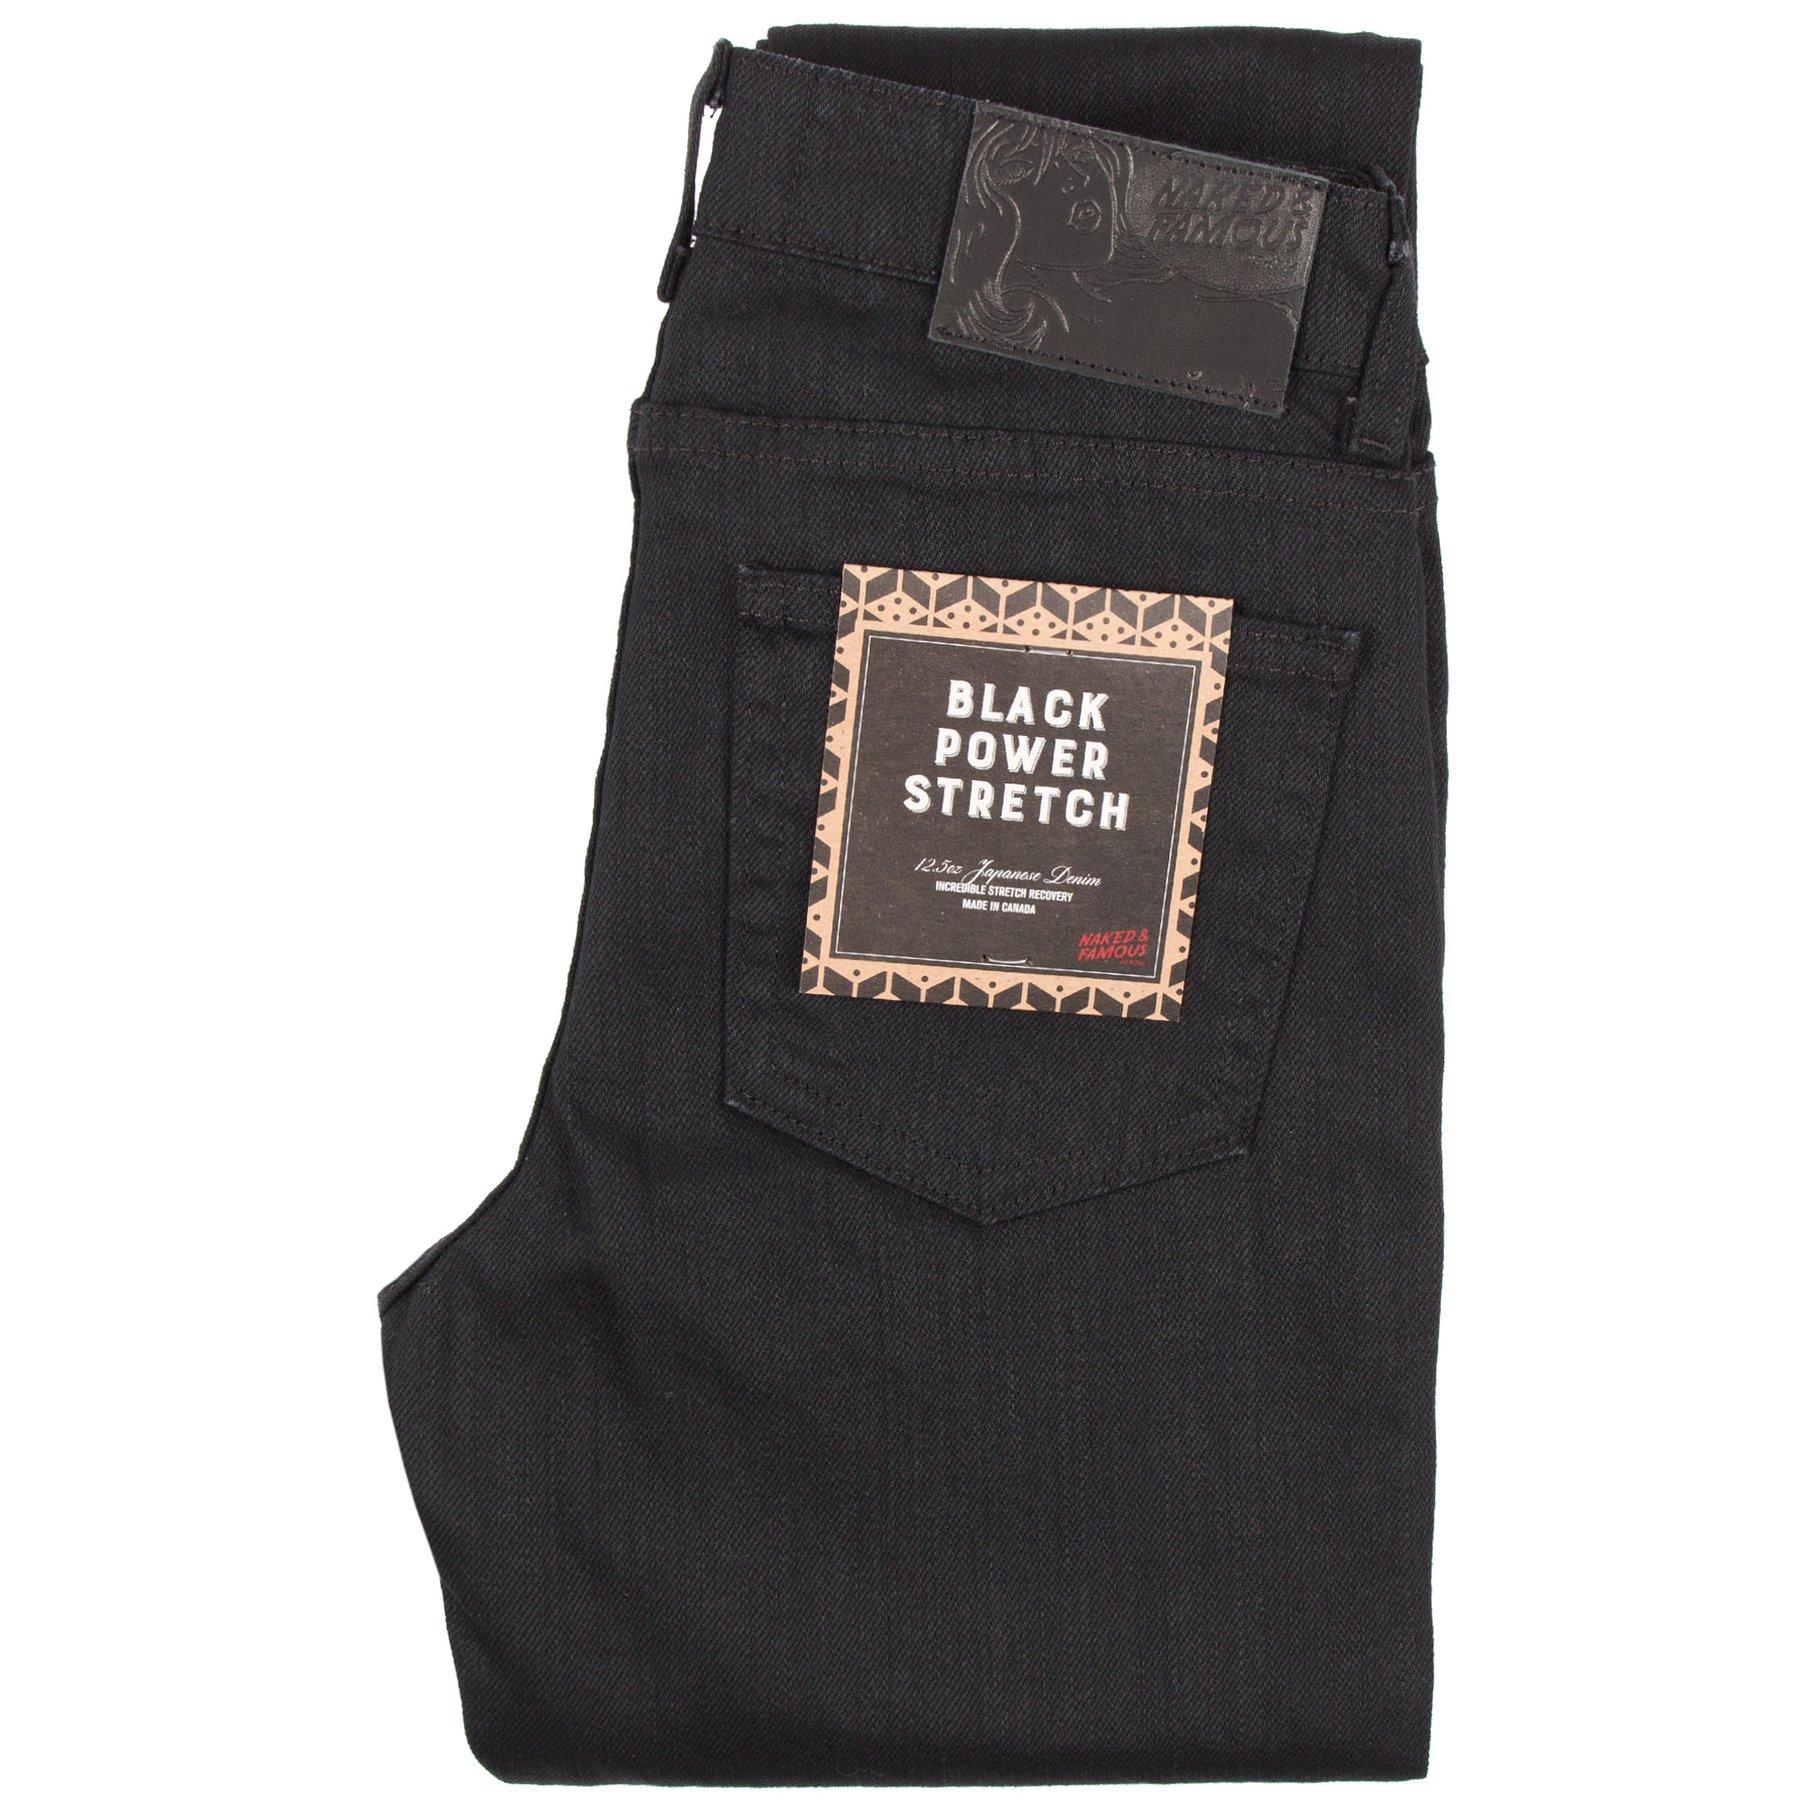 Women's Black Power-Stretch jeans folded view